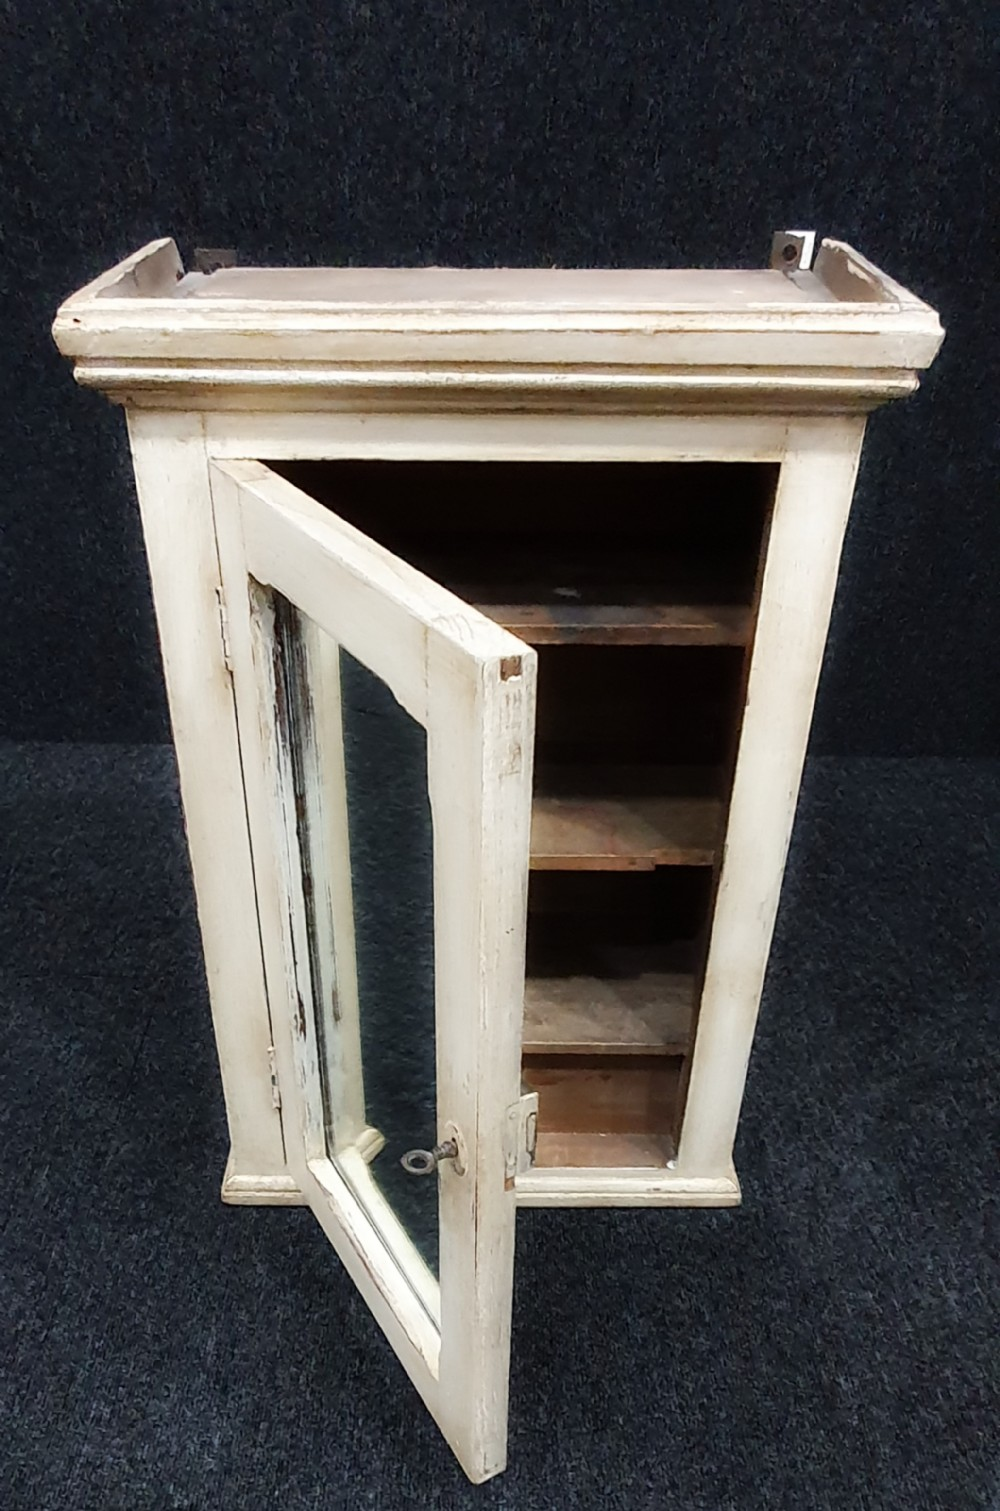 1920 french distressed bathroom cabinet with mirror original key